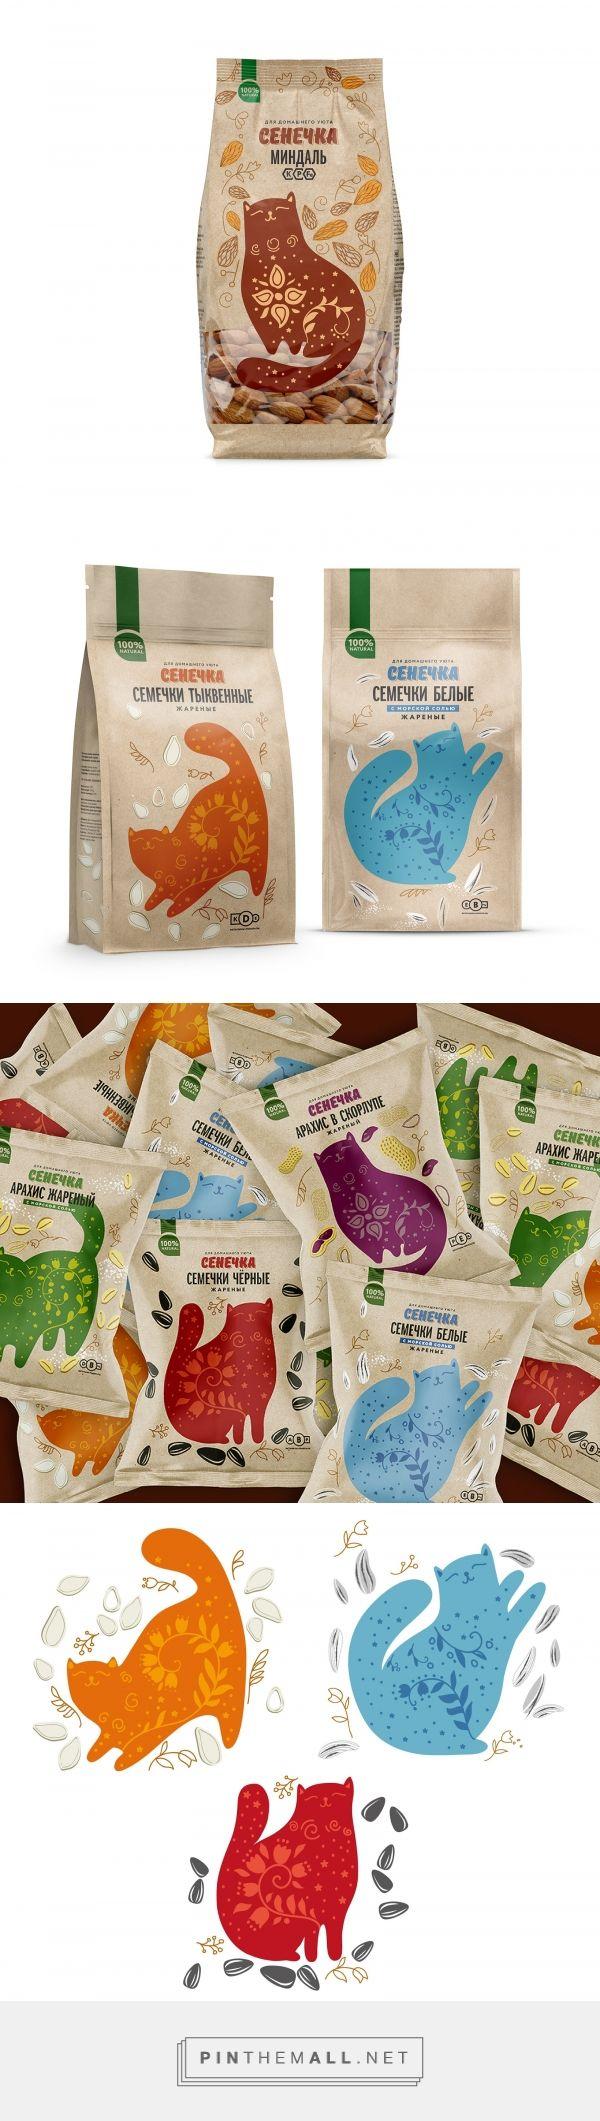 Senechka nuts&seeds - Packaging of the World - Creative Package Design Gallery - http://www.packagingoftheworld.com/2017/04/senechka-nuts.html